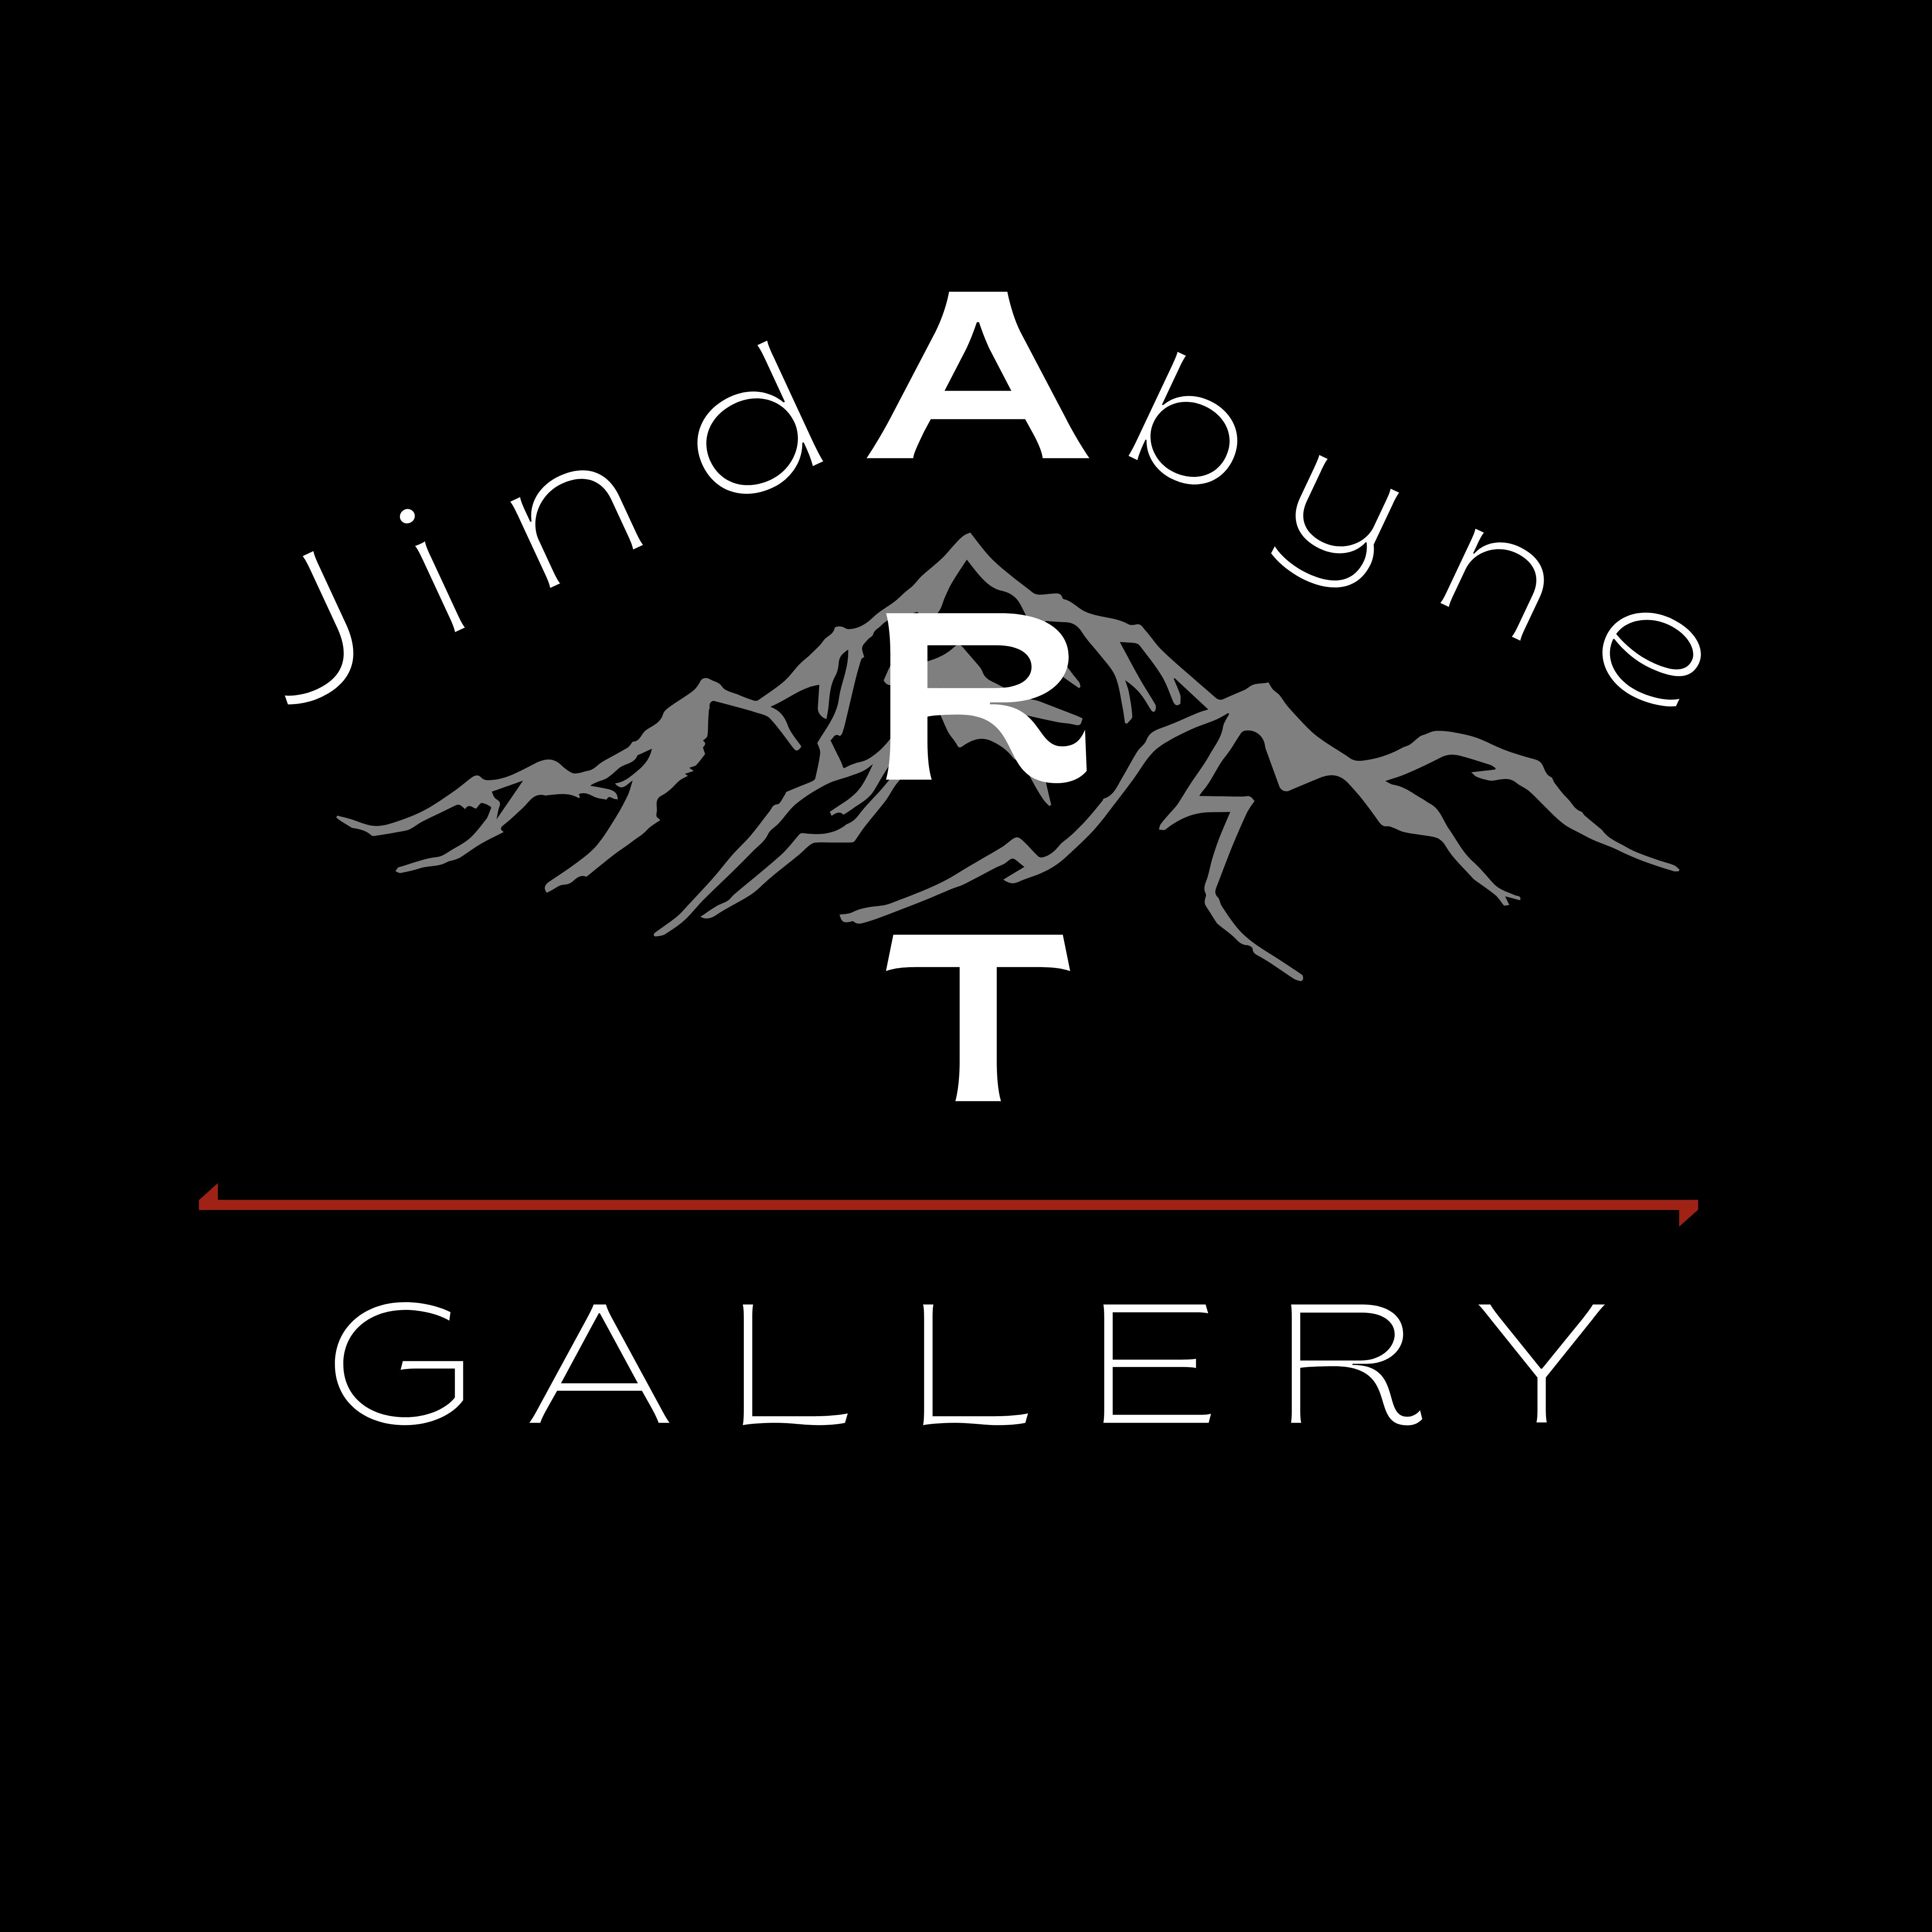 @jindabyneartgallery Profile Image | Linktree